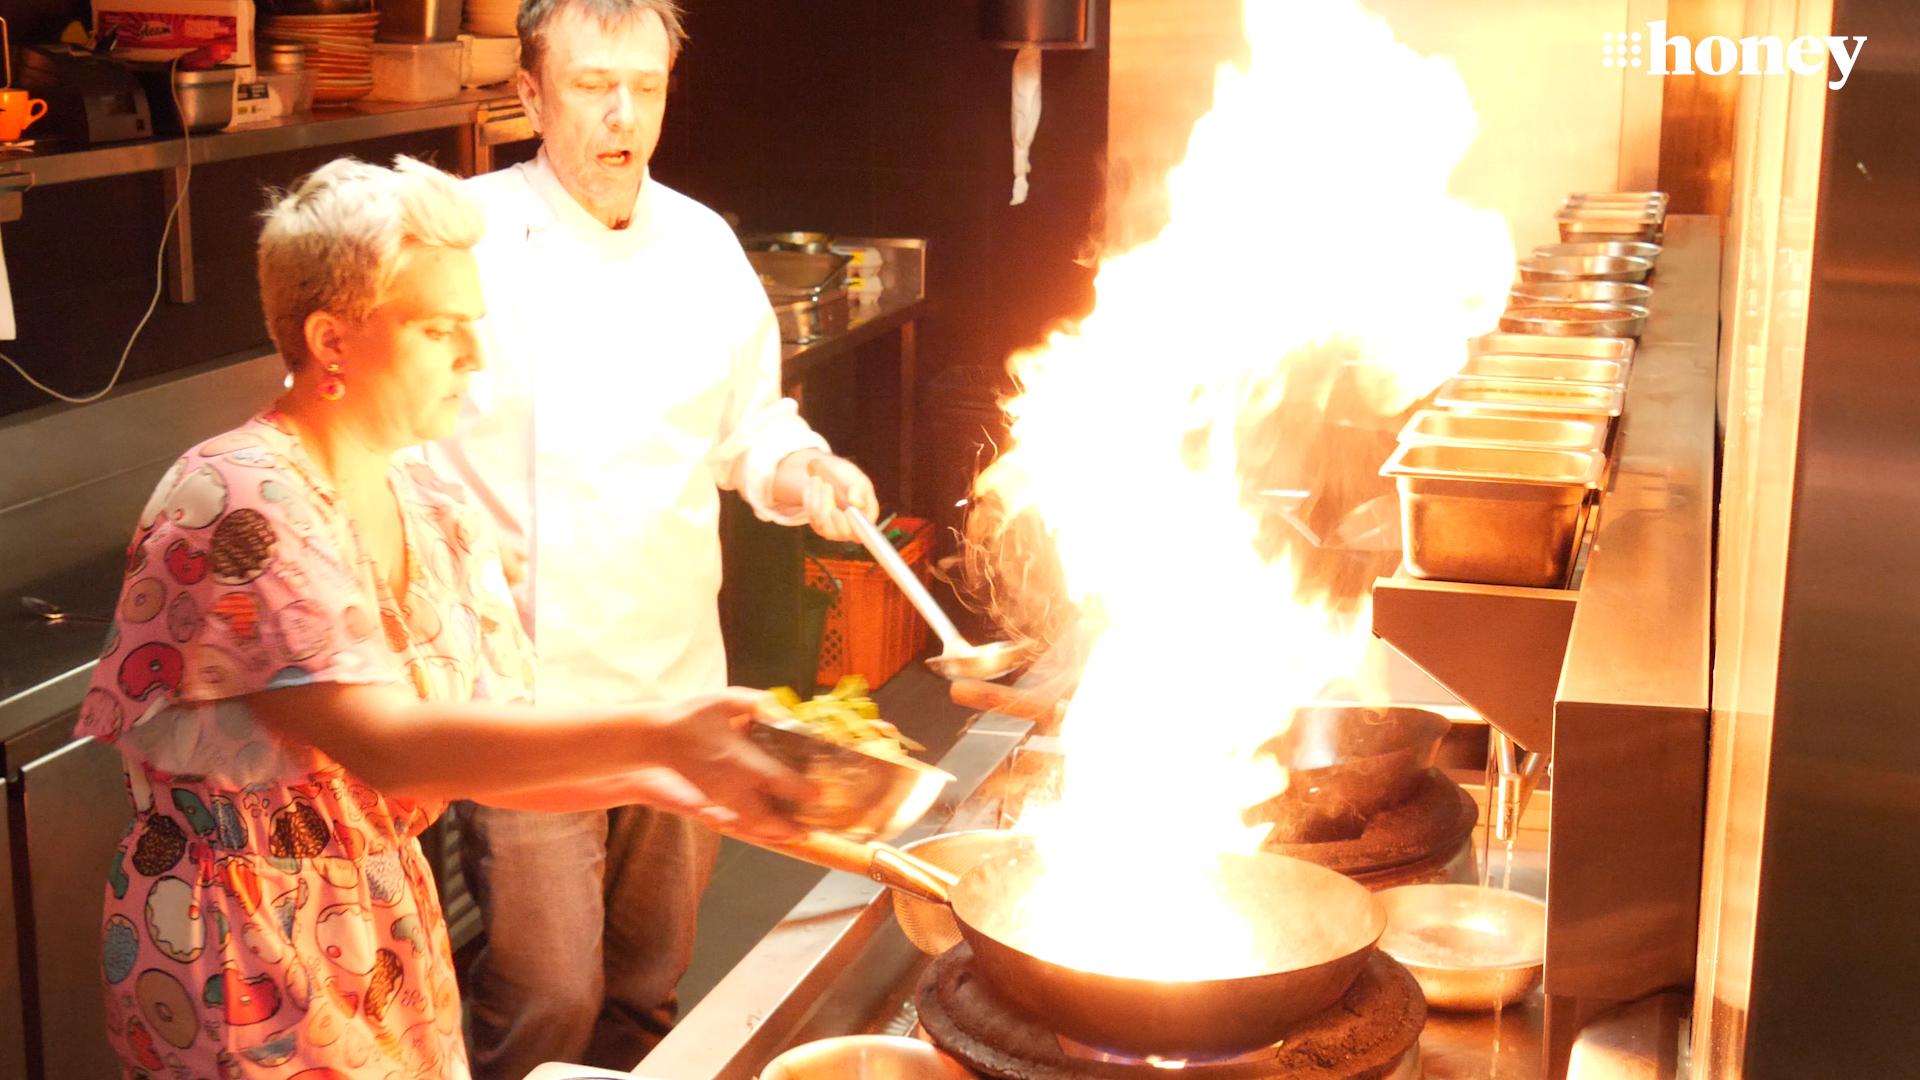 David Thompson schools us on wok technique